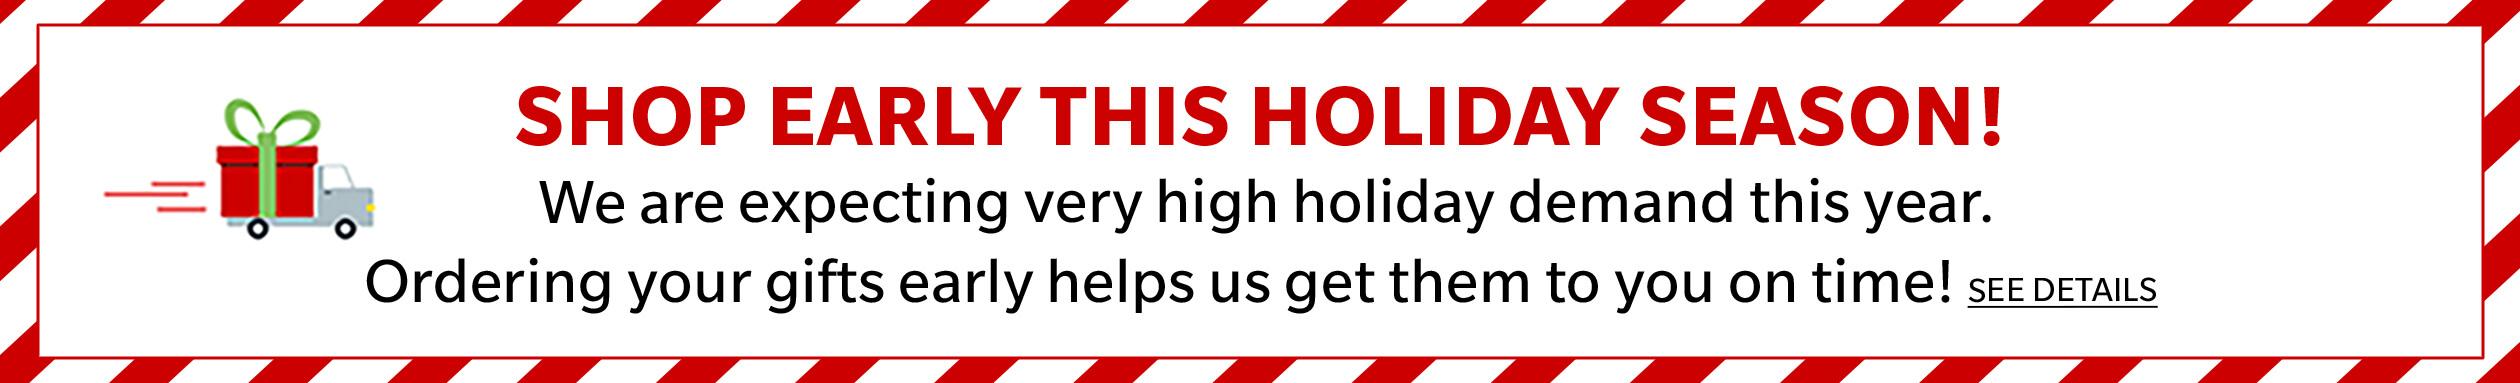 Shop Early this Holiday Season